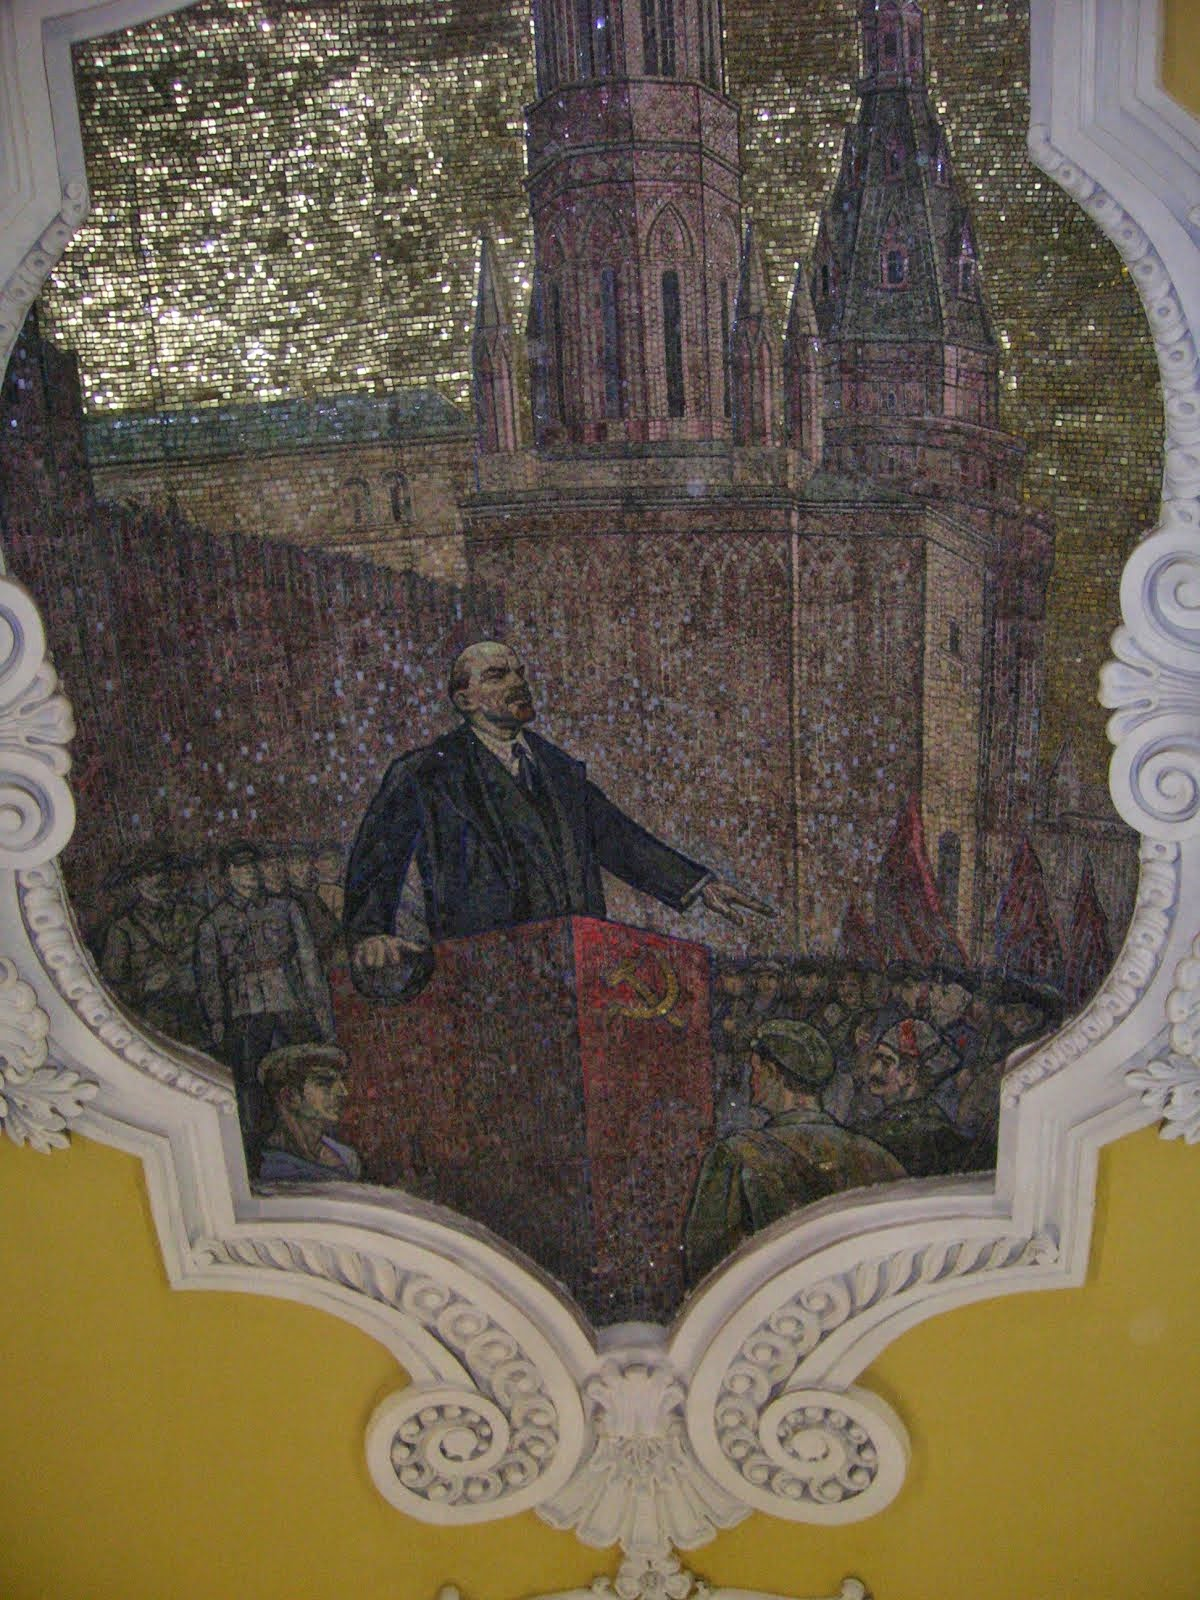 Metro ceiling decoration of Lenin.